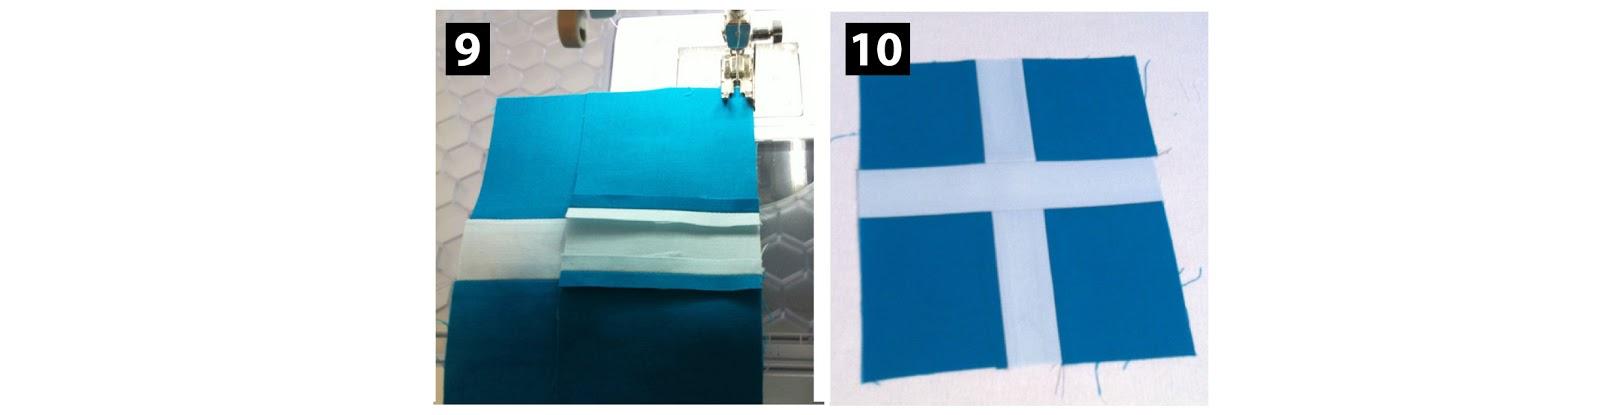 Steps 9 & 10